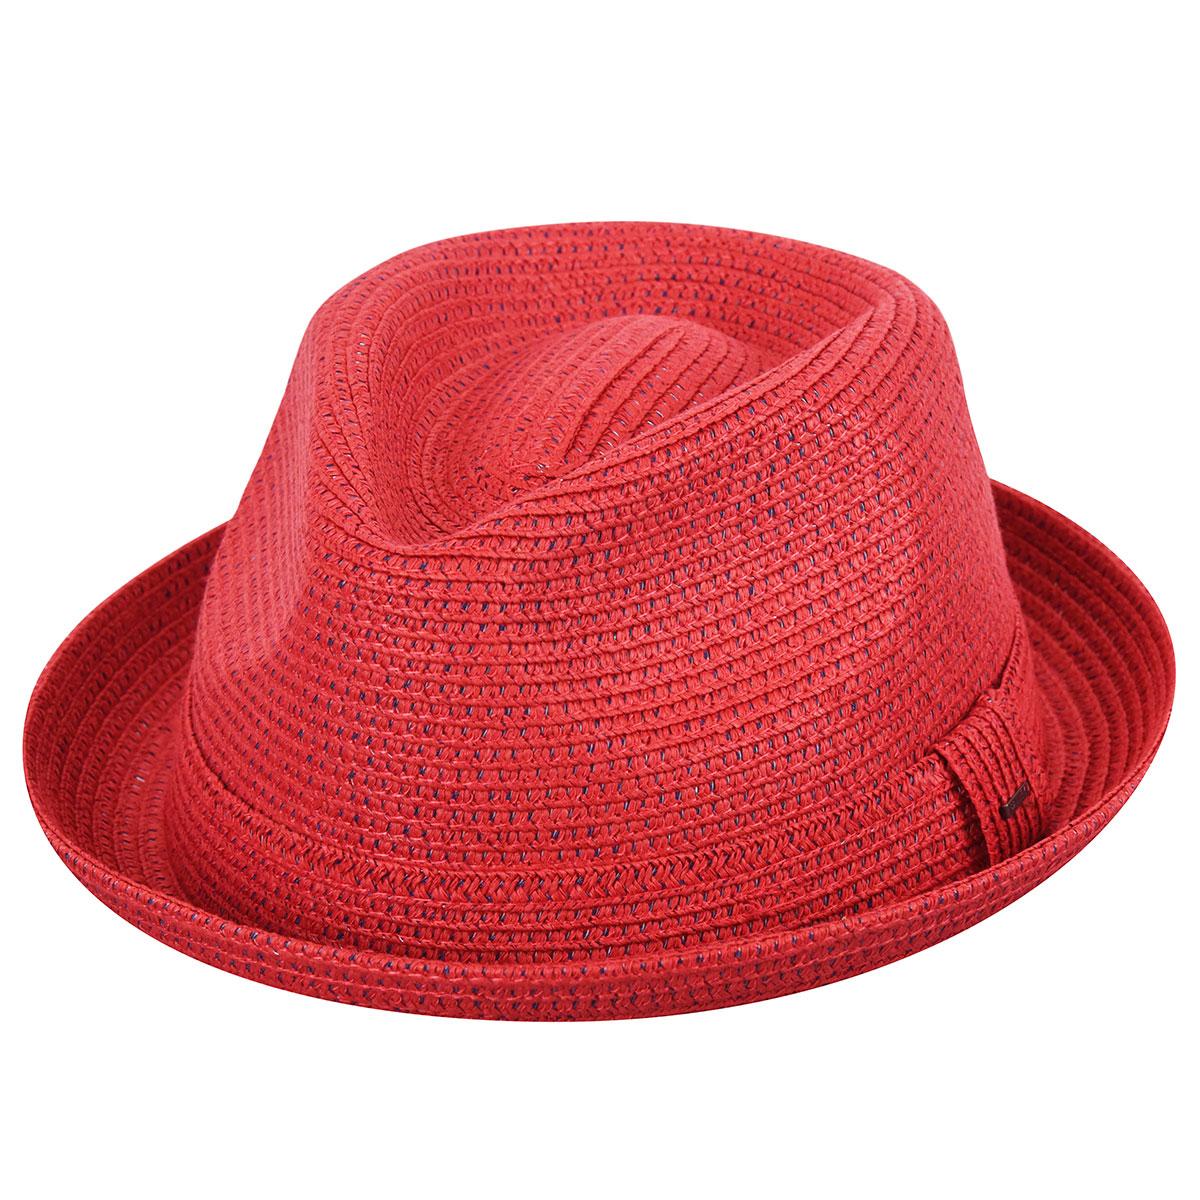 Men's Vintage Style Hats, Retro Hats Billy Braided Trilby $49.50 AT vintagedancer.com